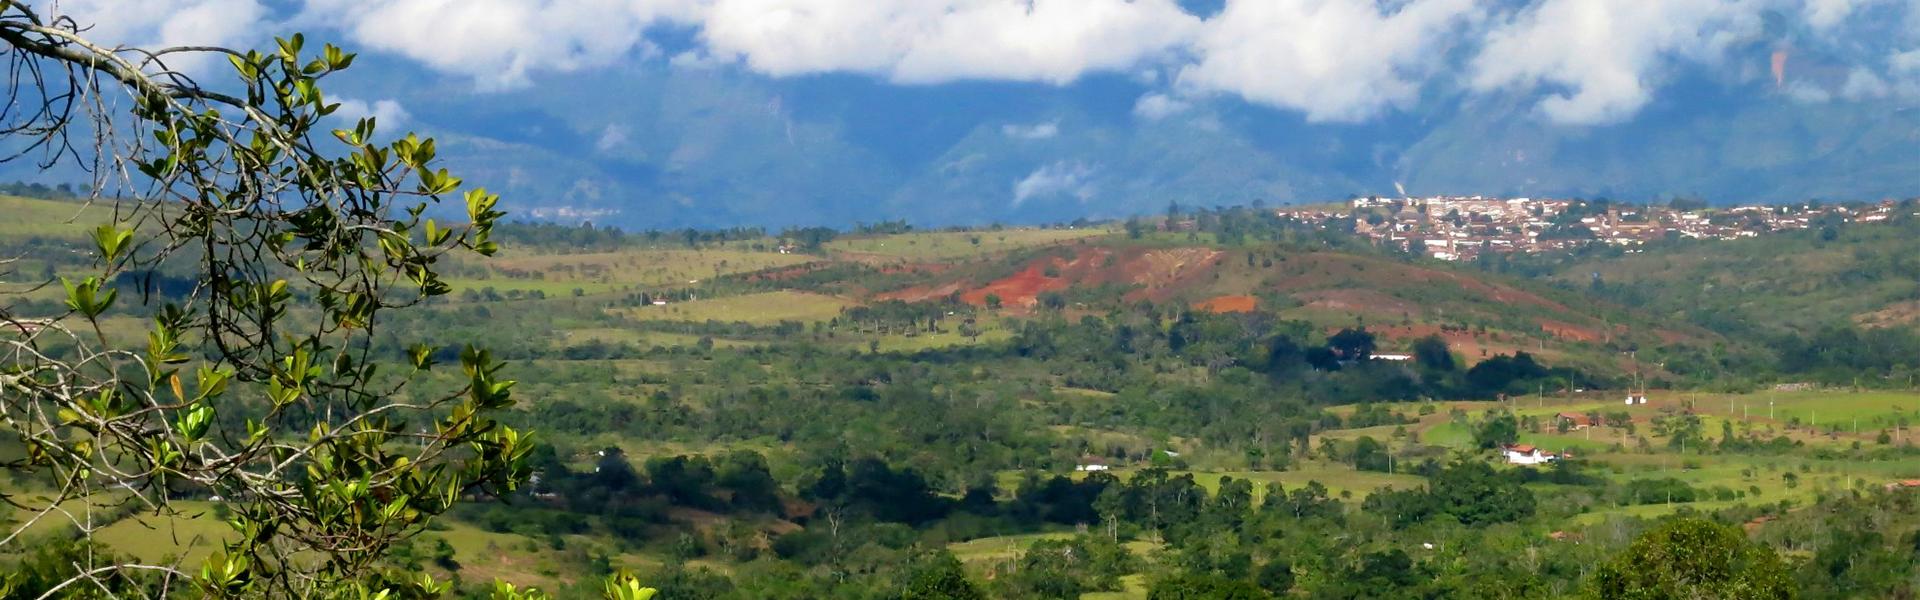 Barilocha Countryside